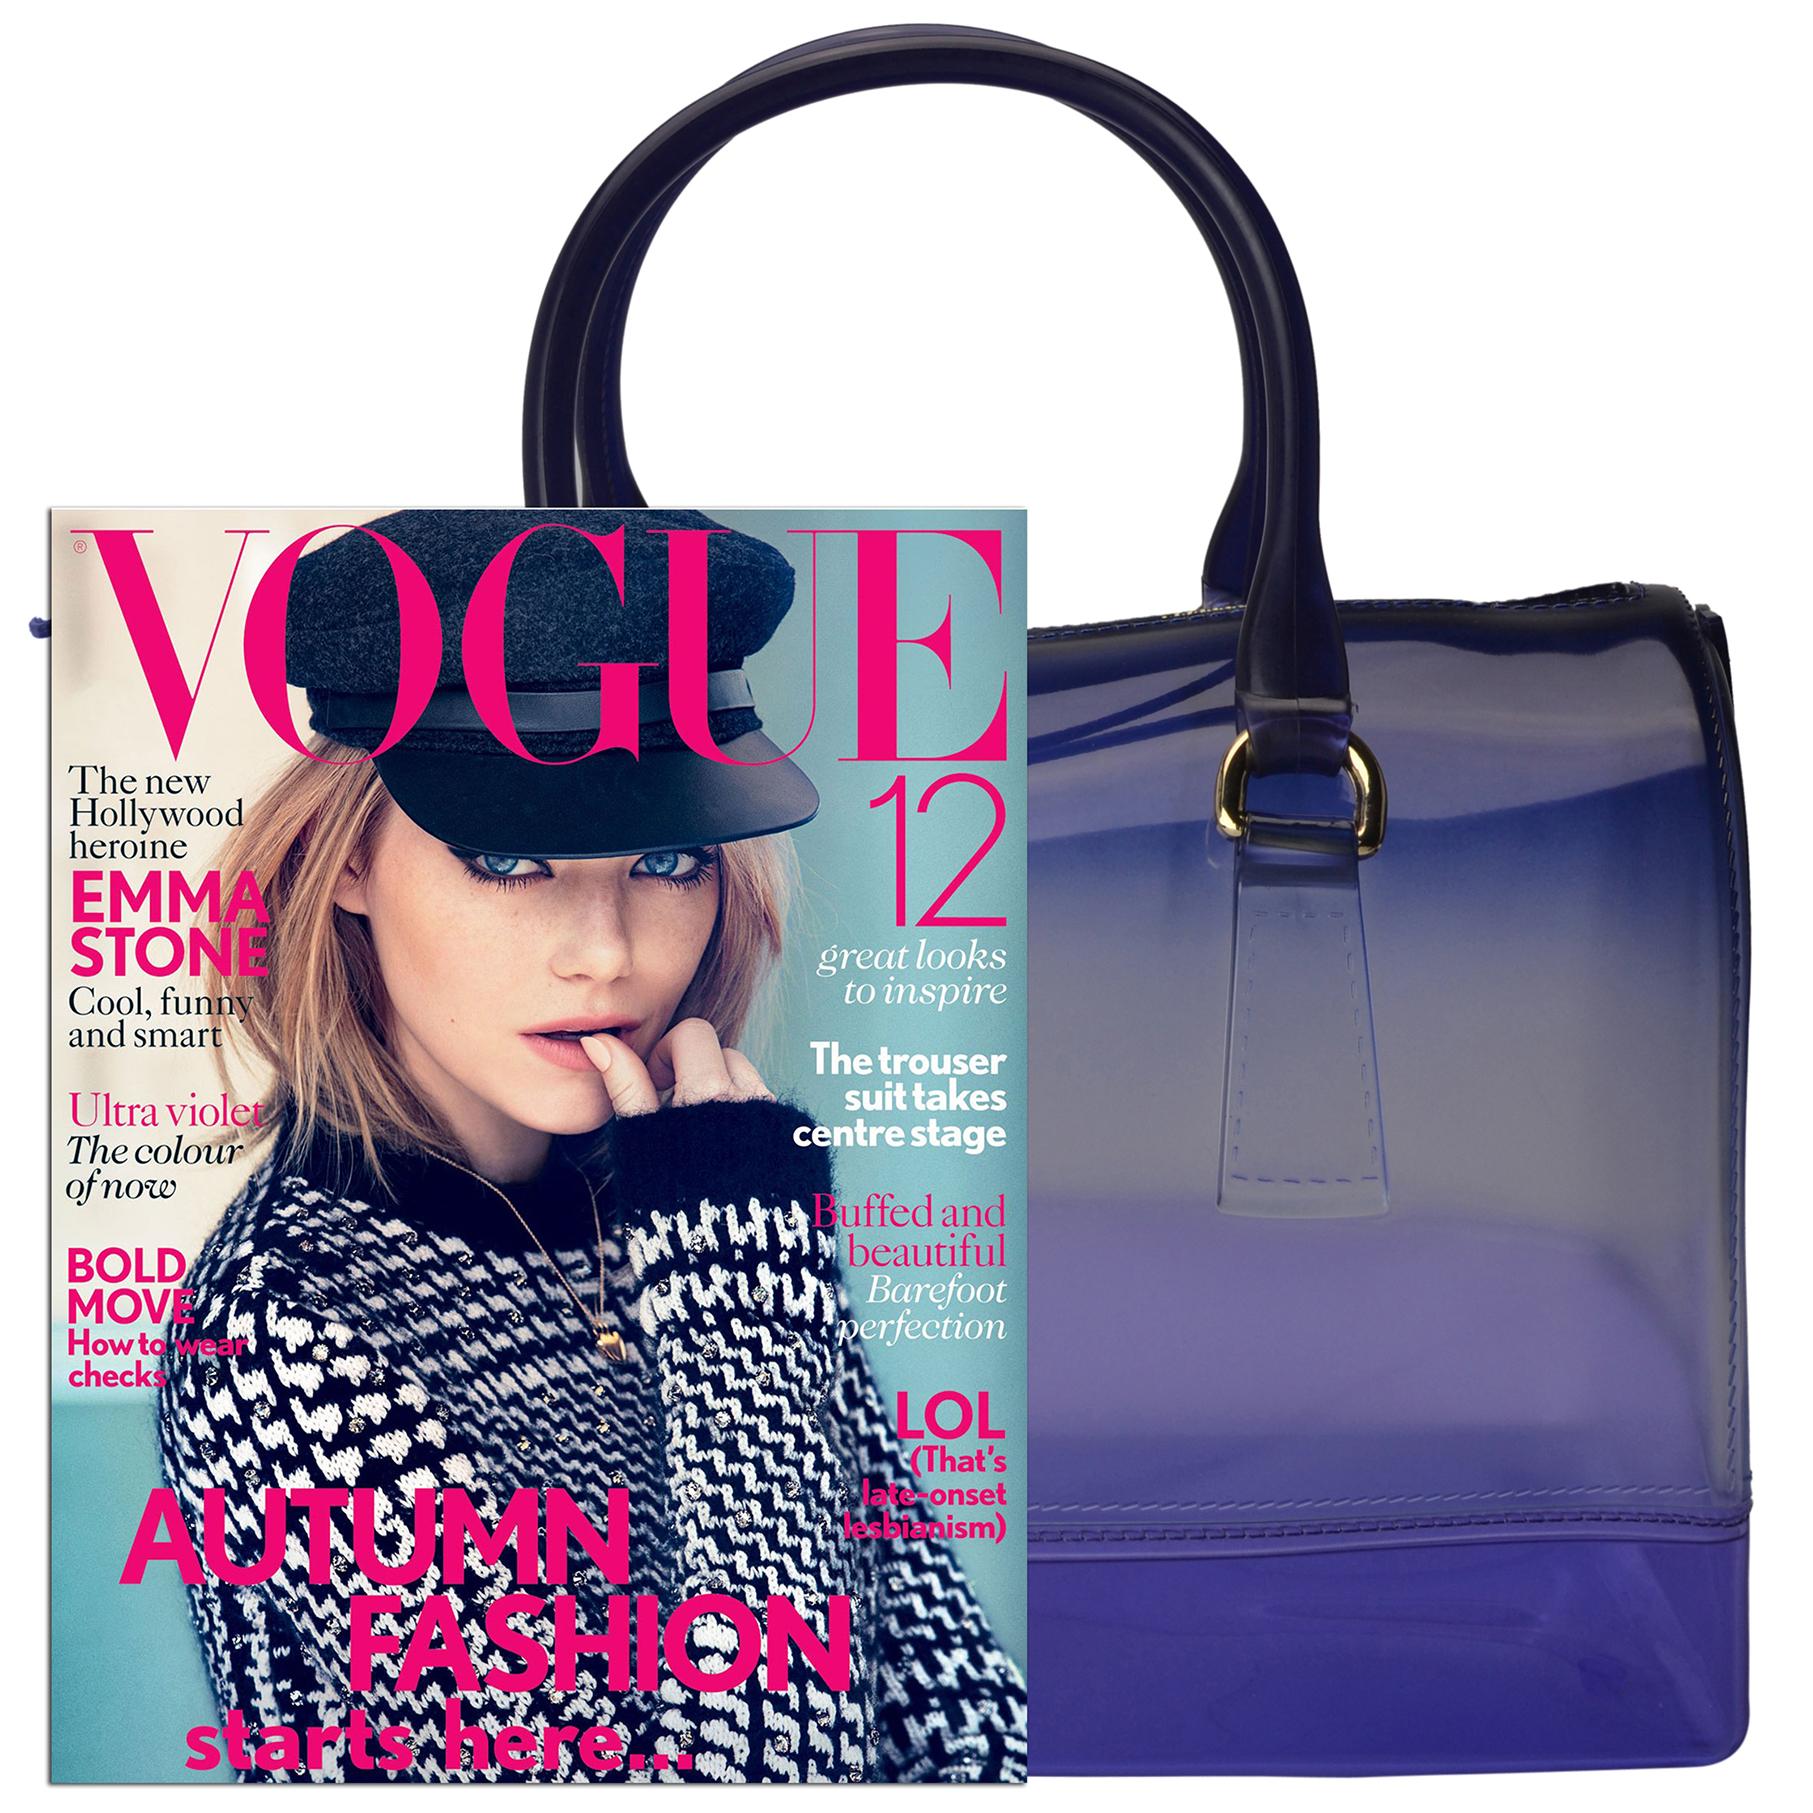 mg-collection-kaley-jelly-style-tote-handbag-jsh-lmq-608nvpp-4.jpg